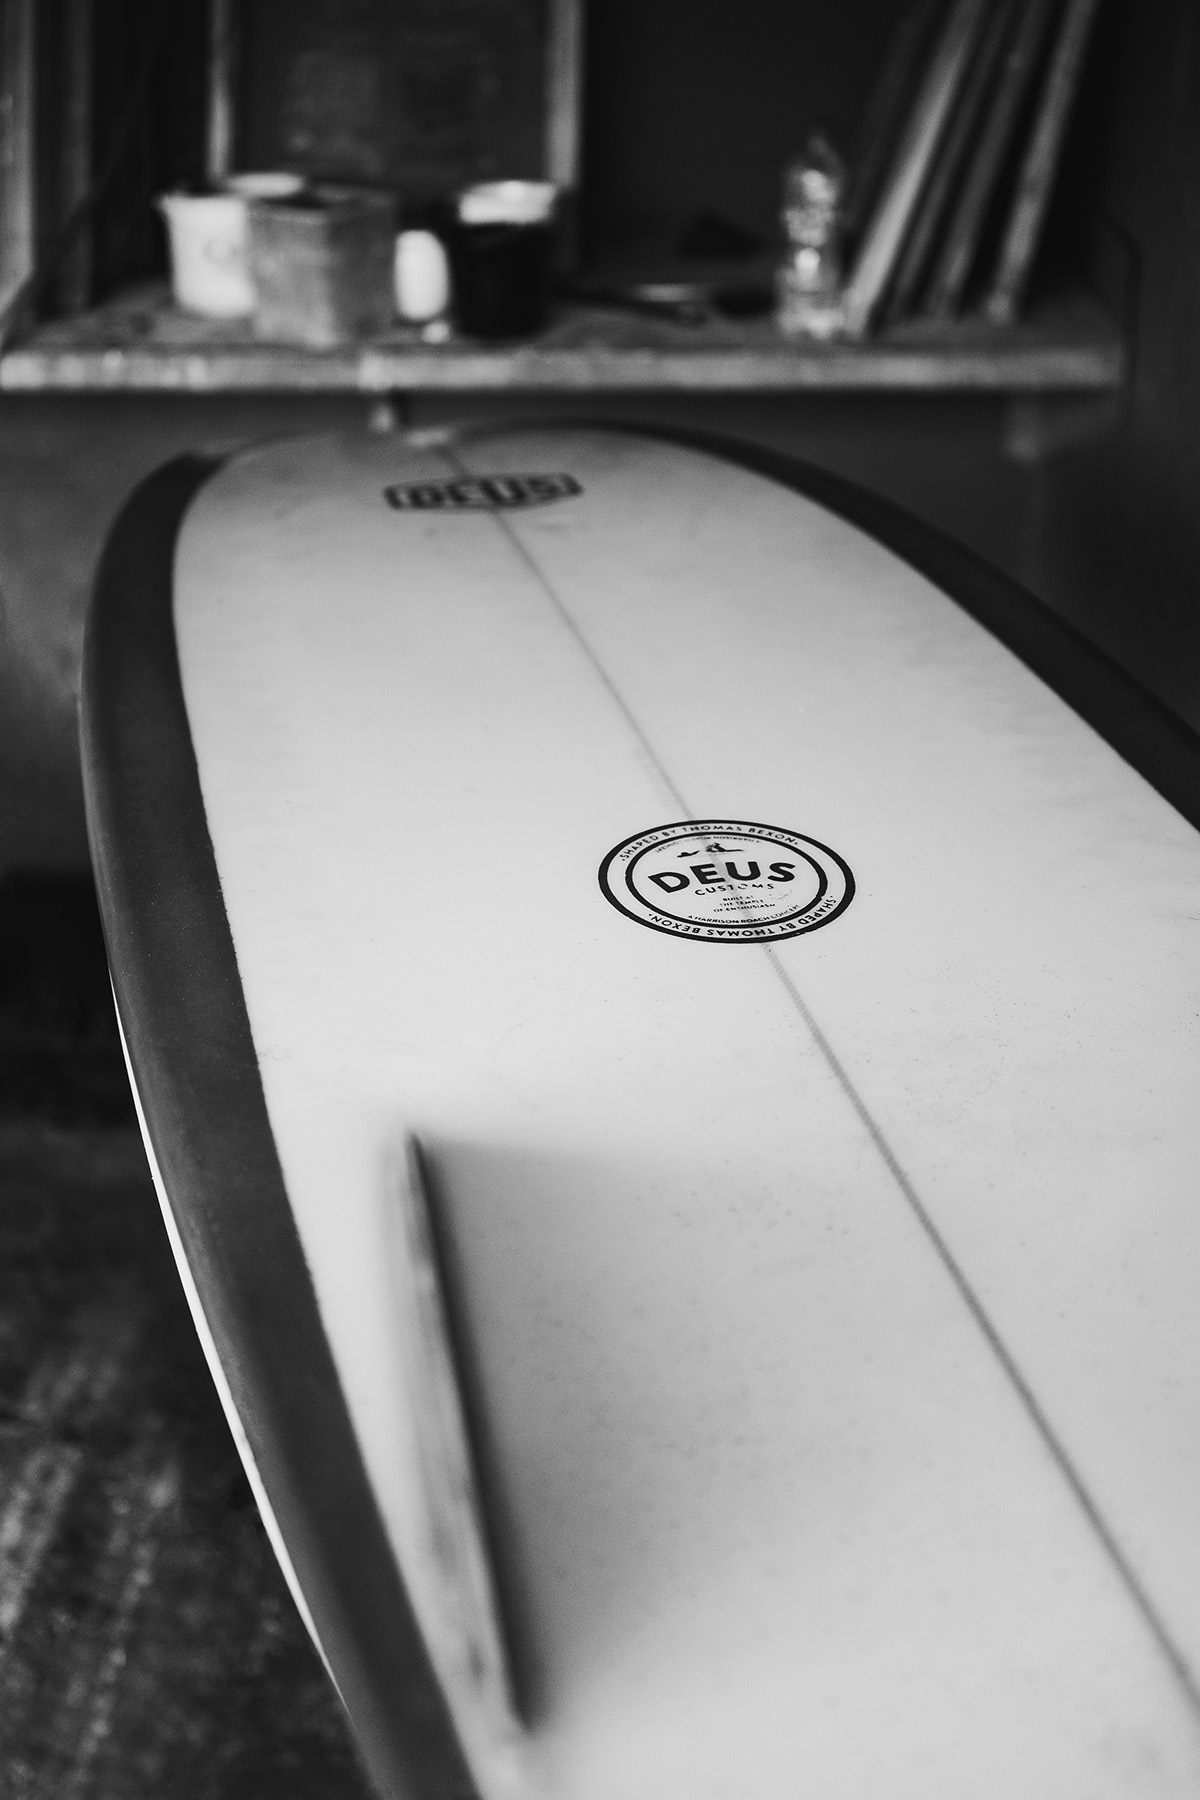 bali-surfing-canggu-deus-aurfboard-travel.jpg